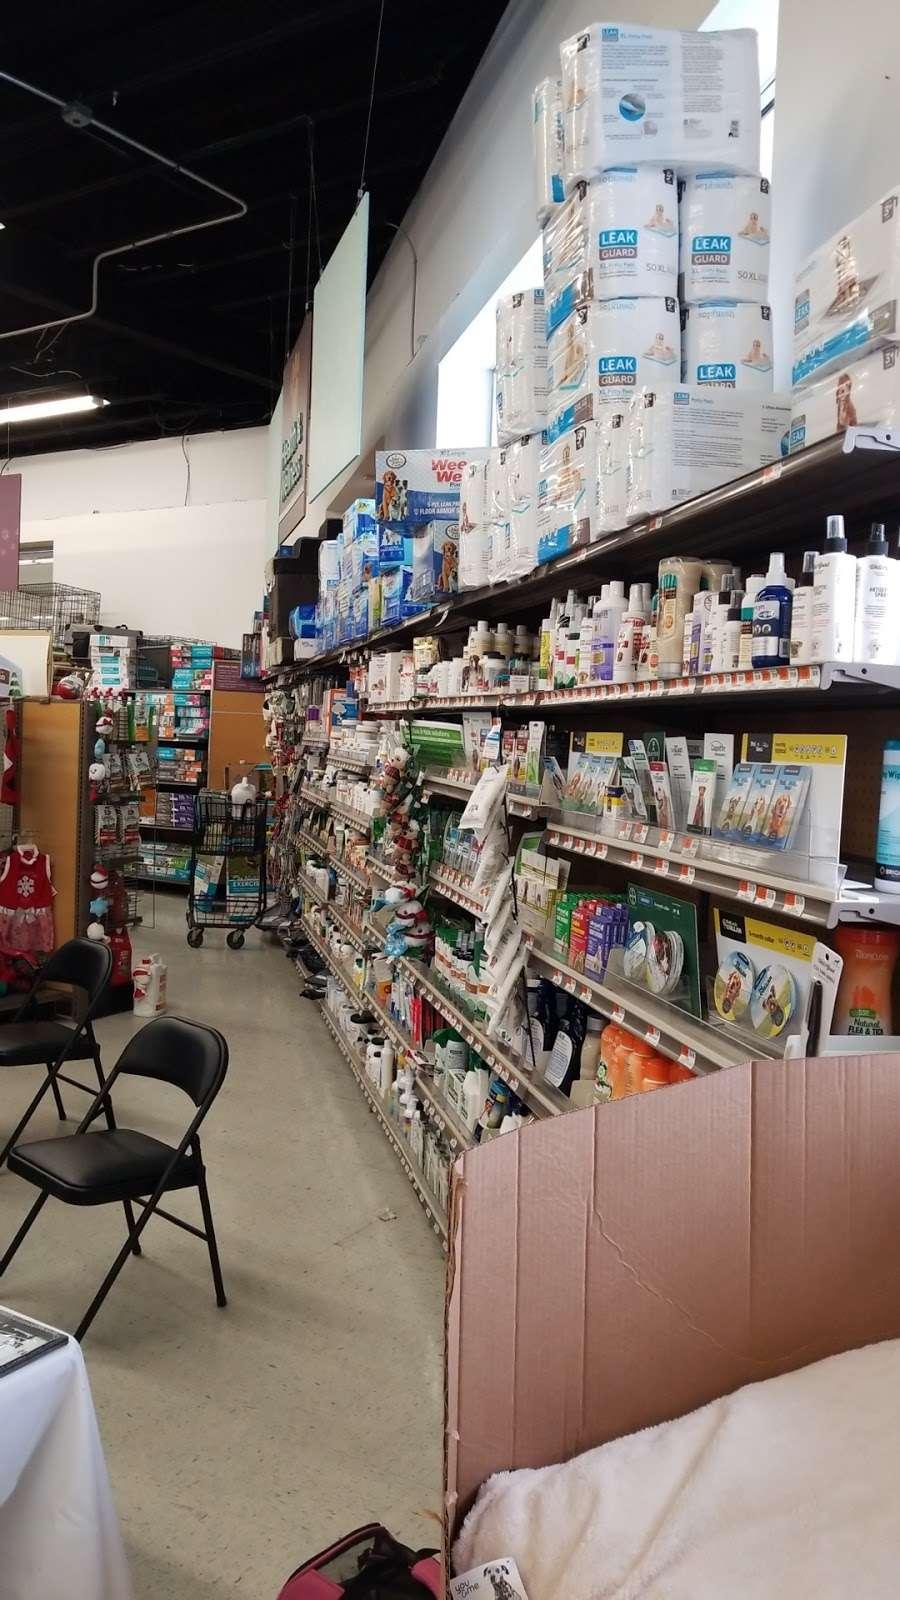 Petco Animal Supplies - store    Photo 7 of 10   Address: 780 Rte 3 West, Clifton, NJ 07012, USA   Phone: (973) 472-3344